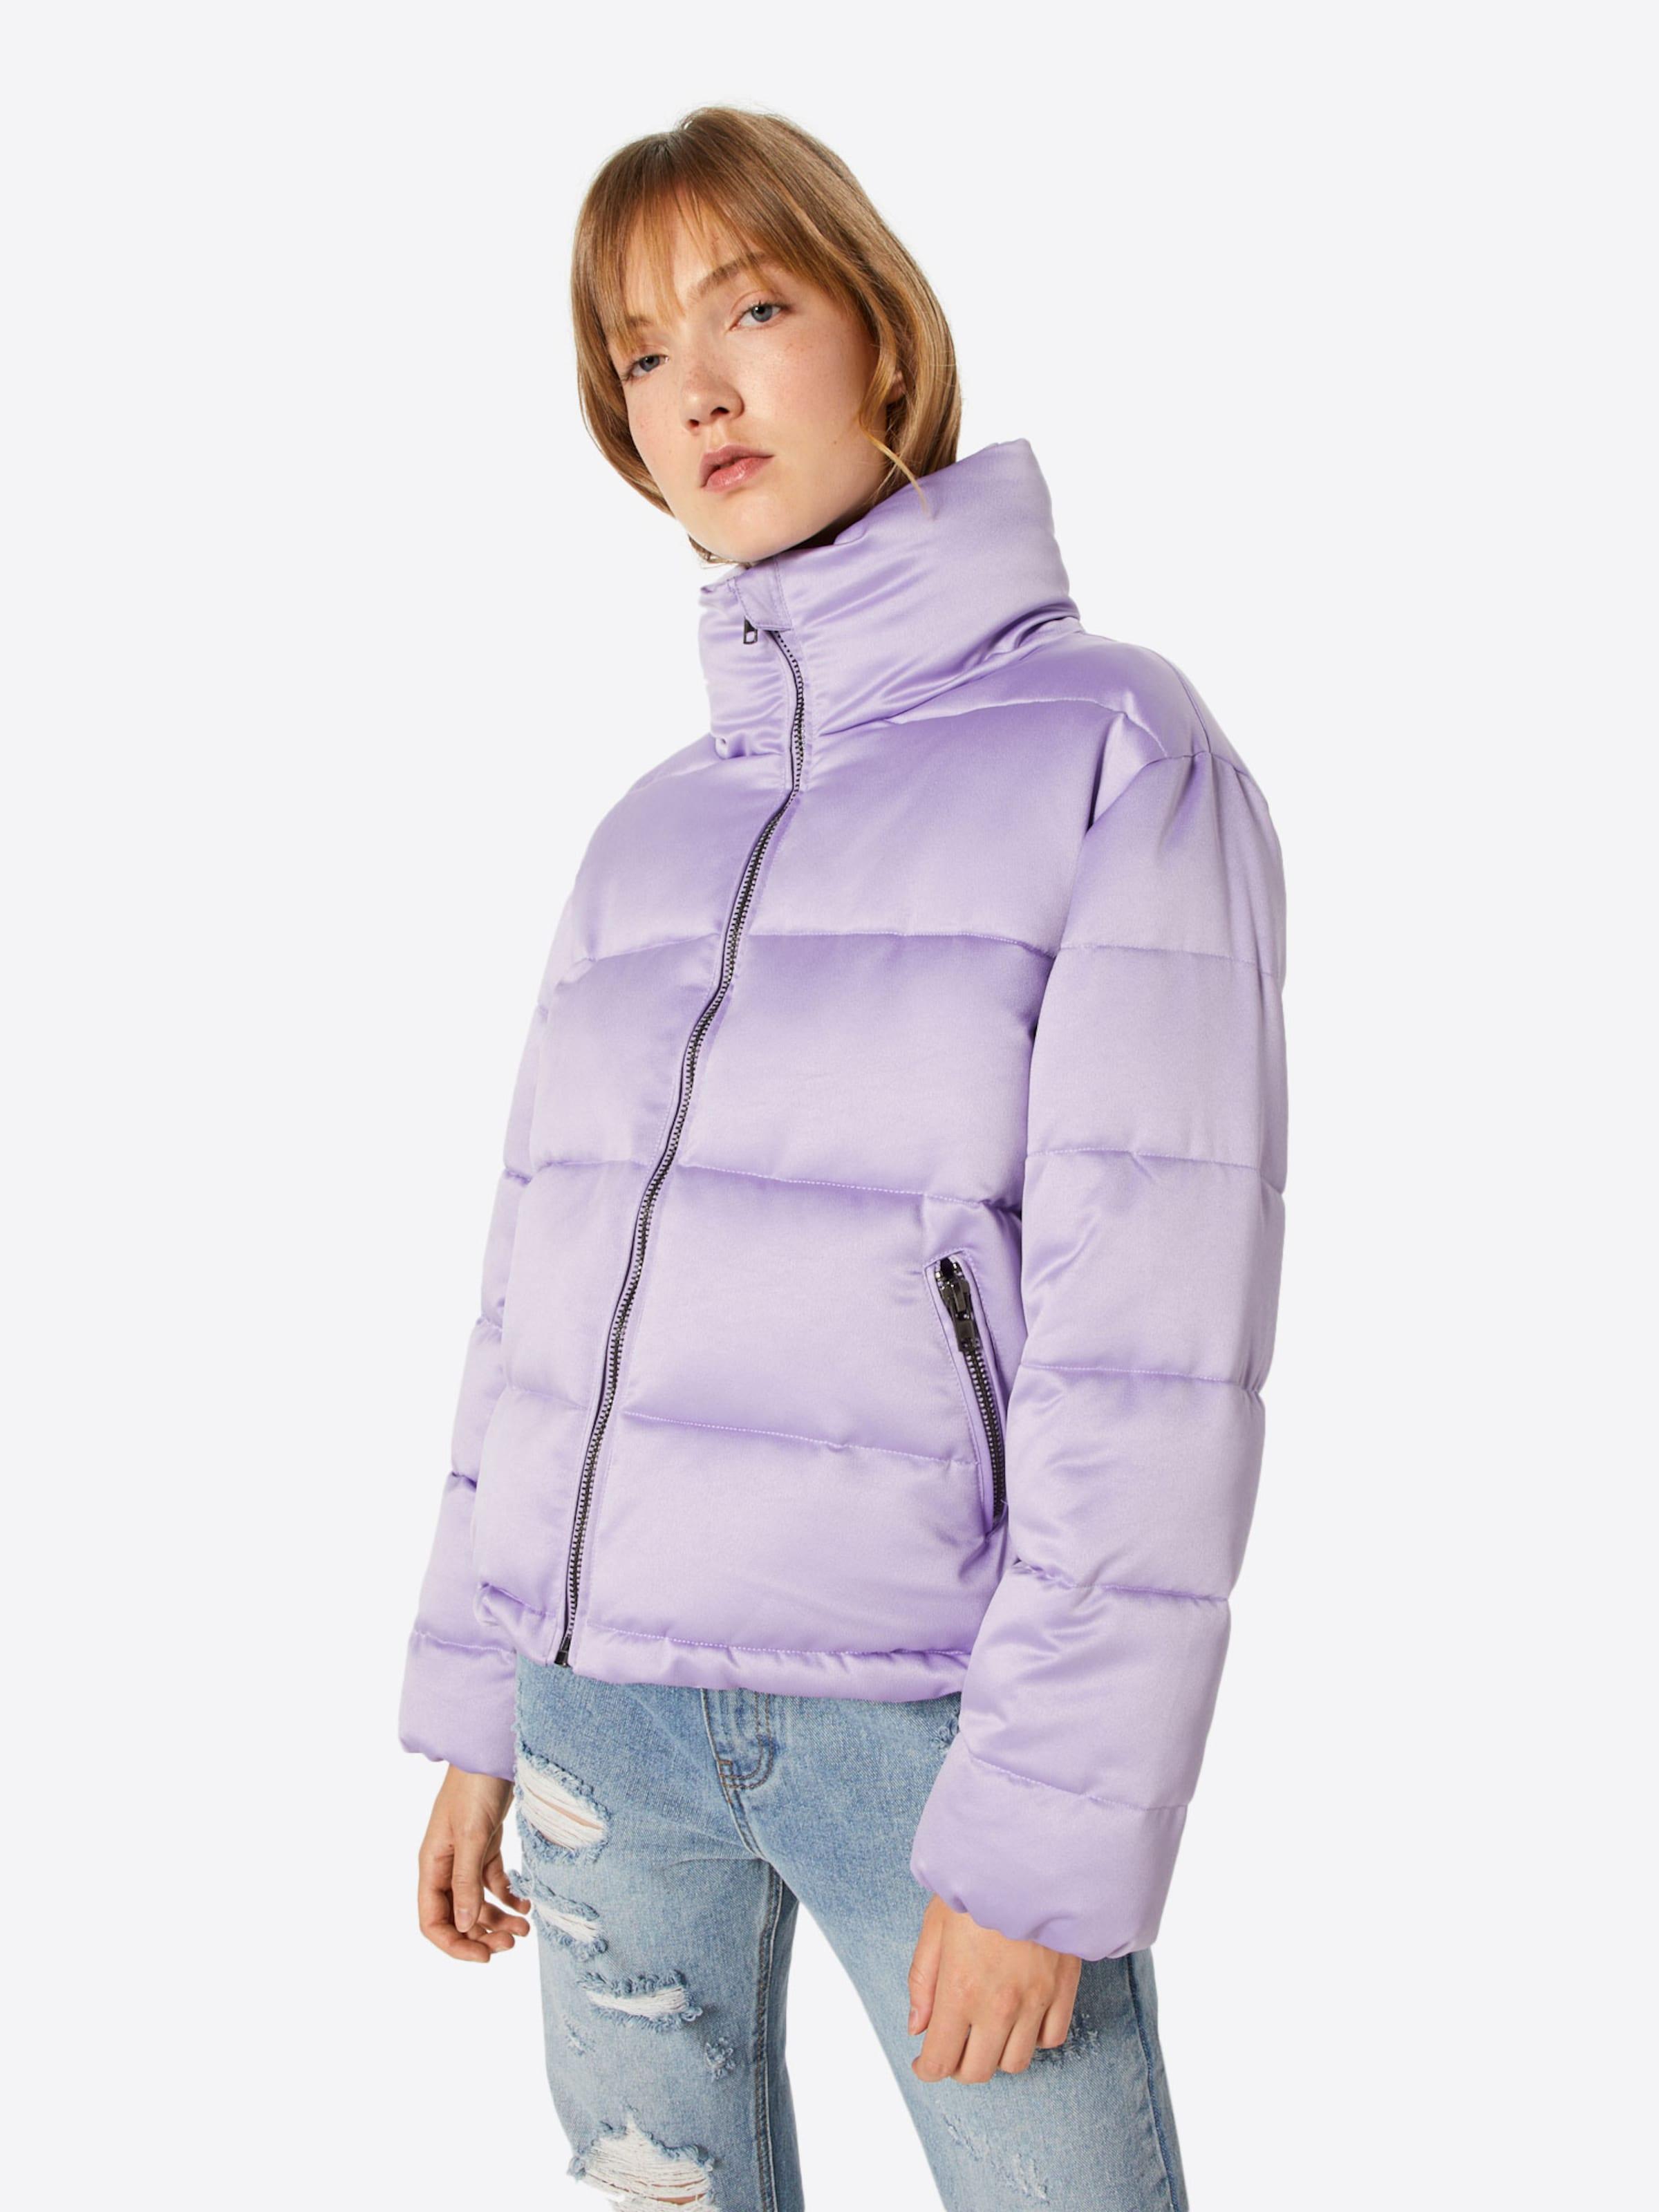 Veste En Violet Glamorous Mi 'ac1206' saison H9EDIWb2eY